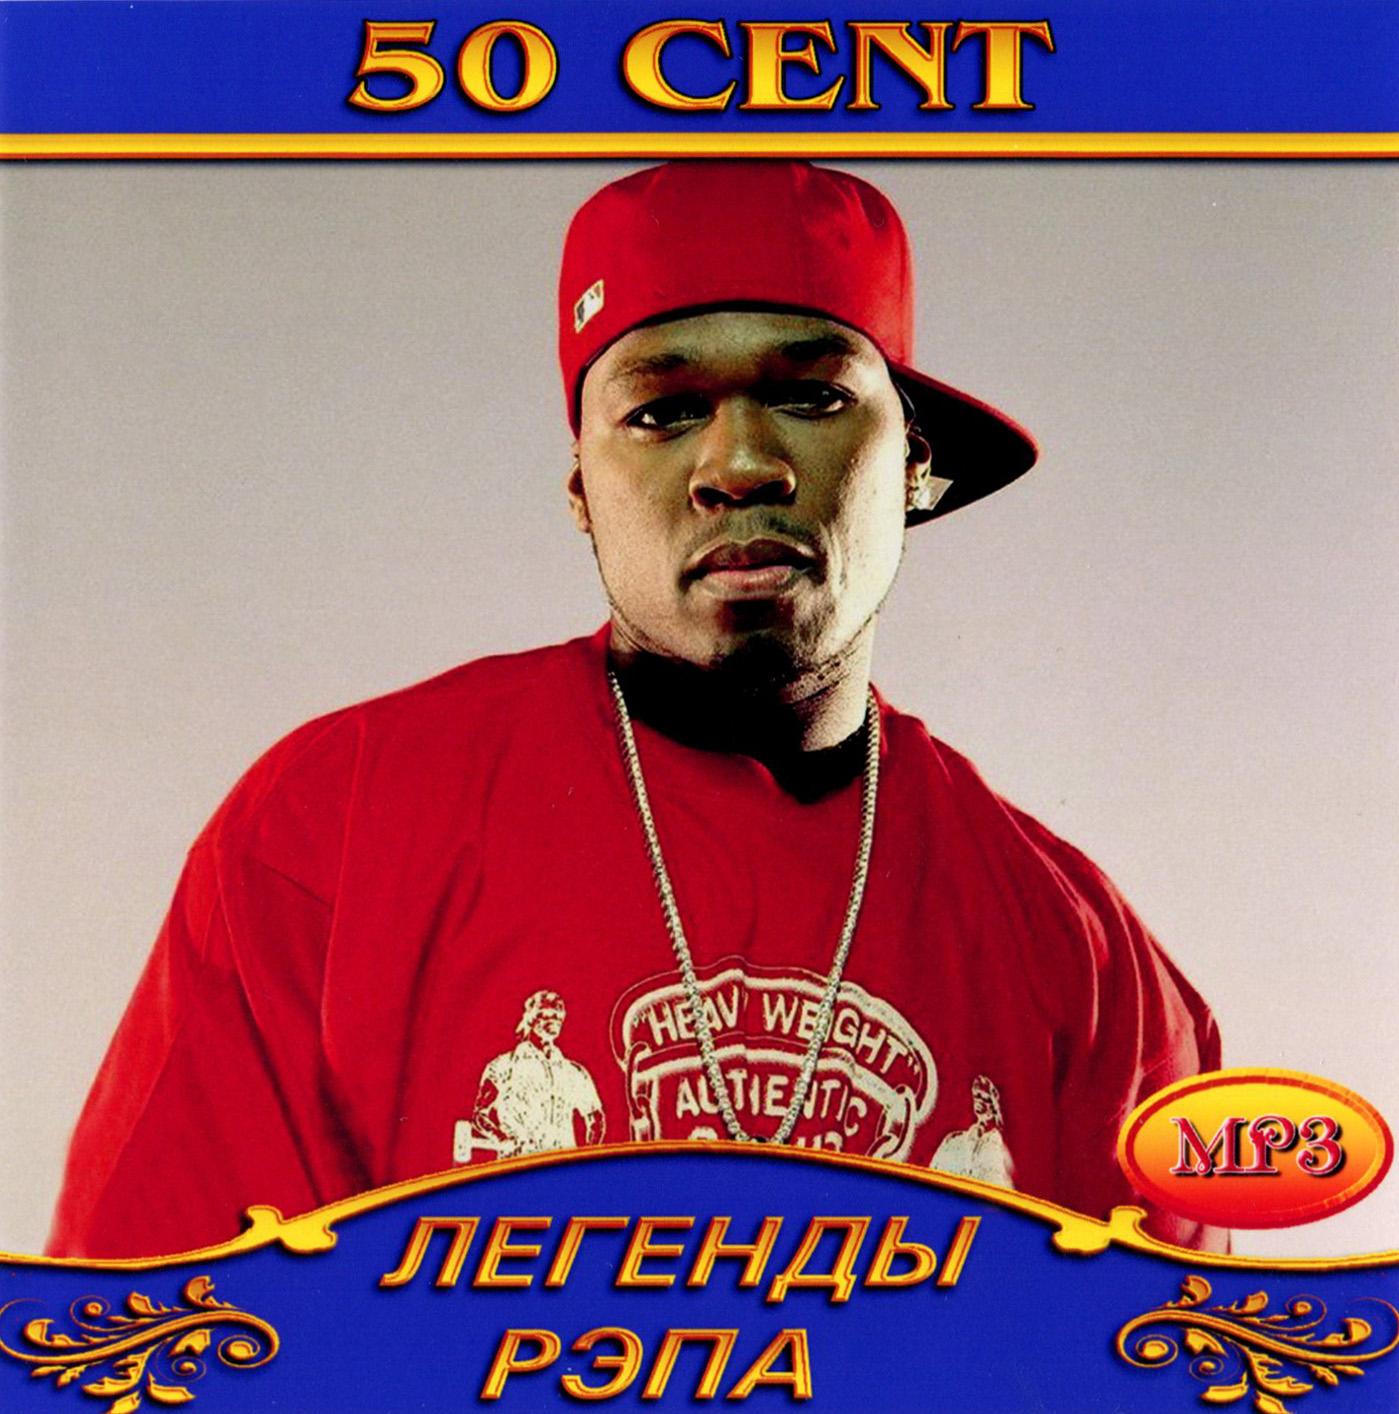 50 Cent [mp3]